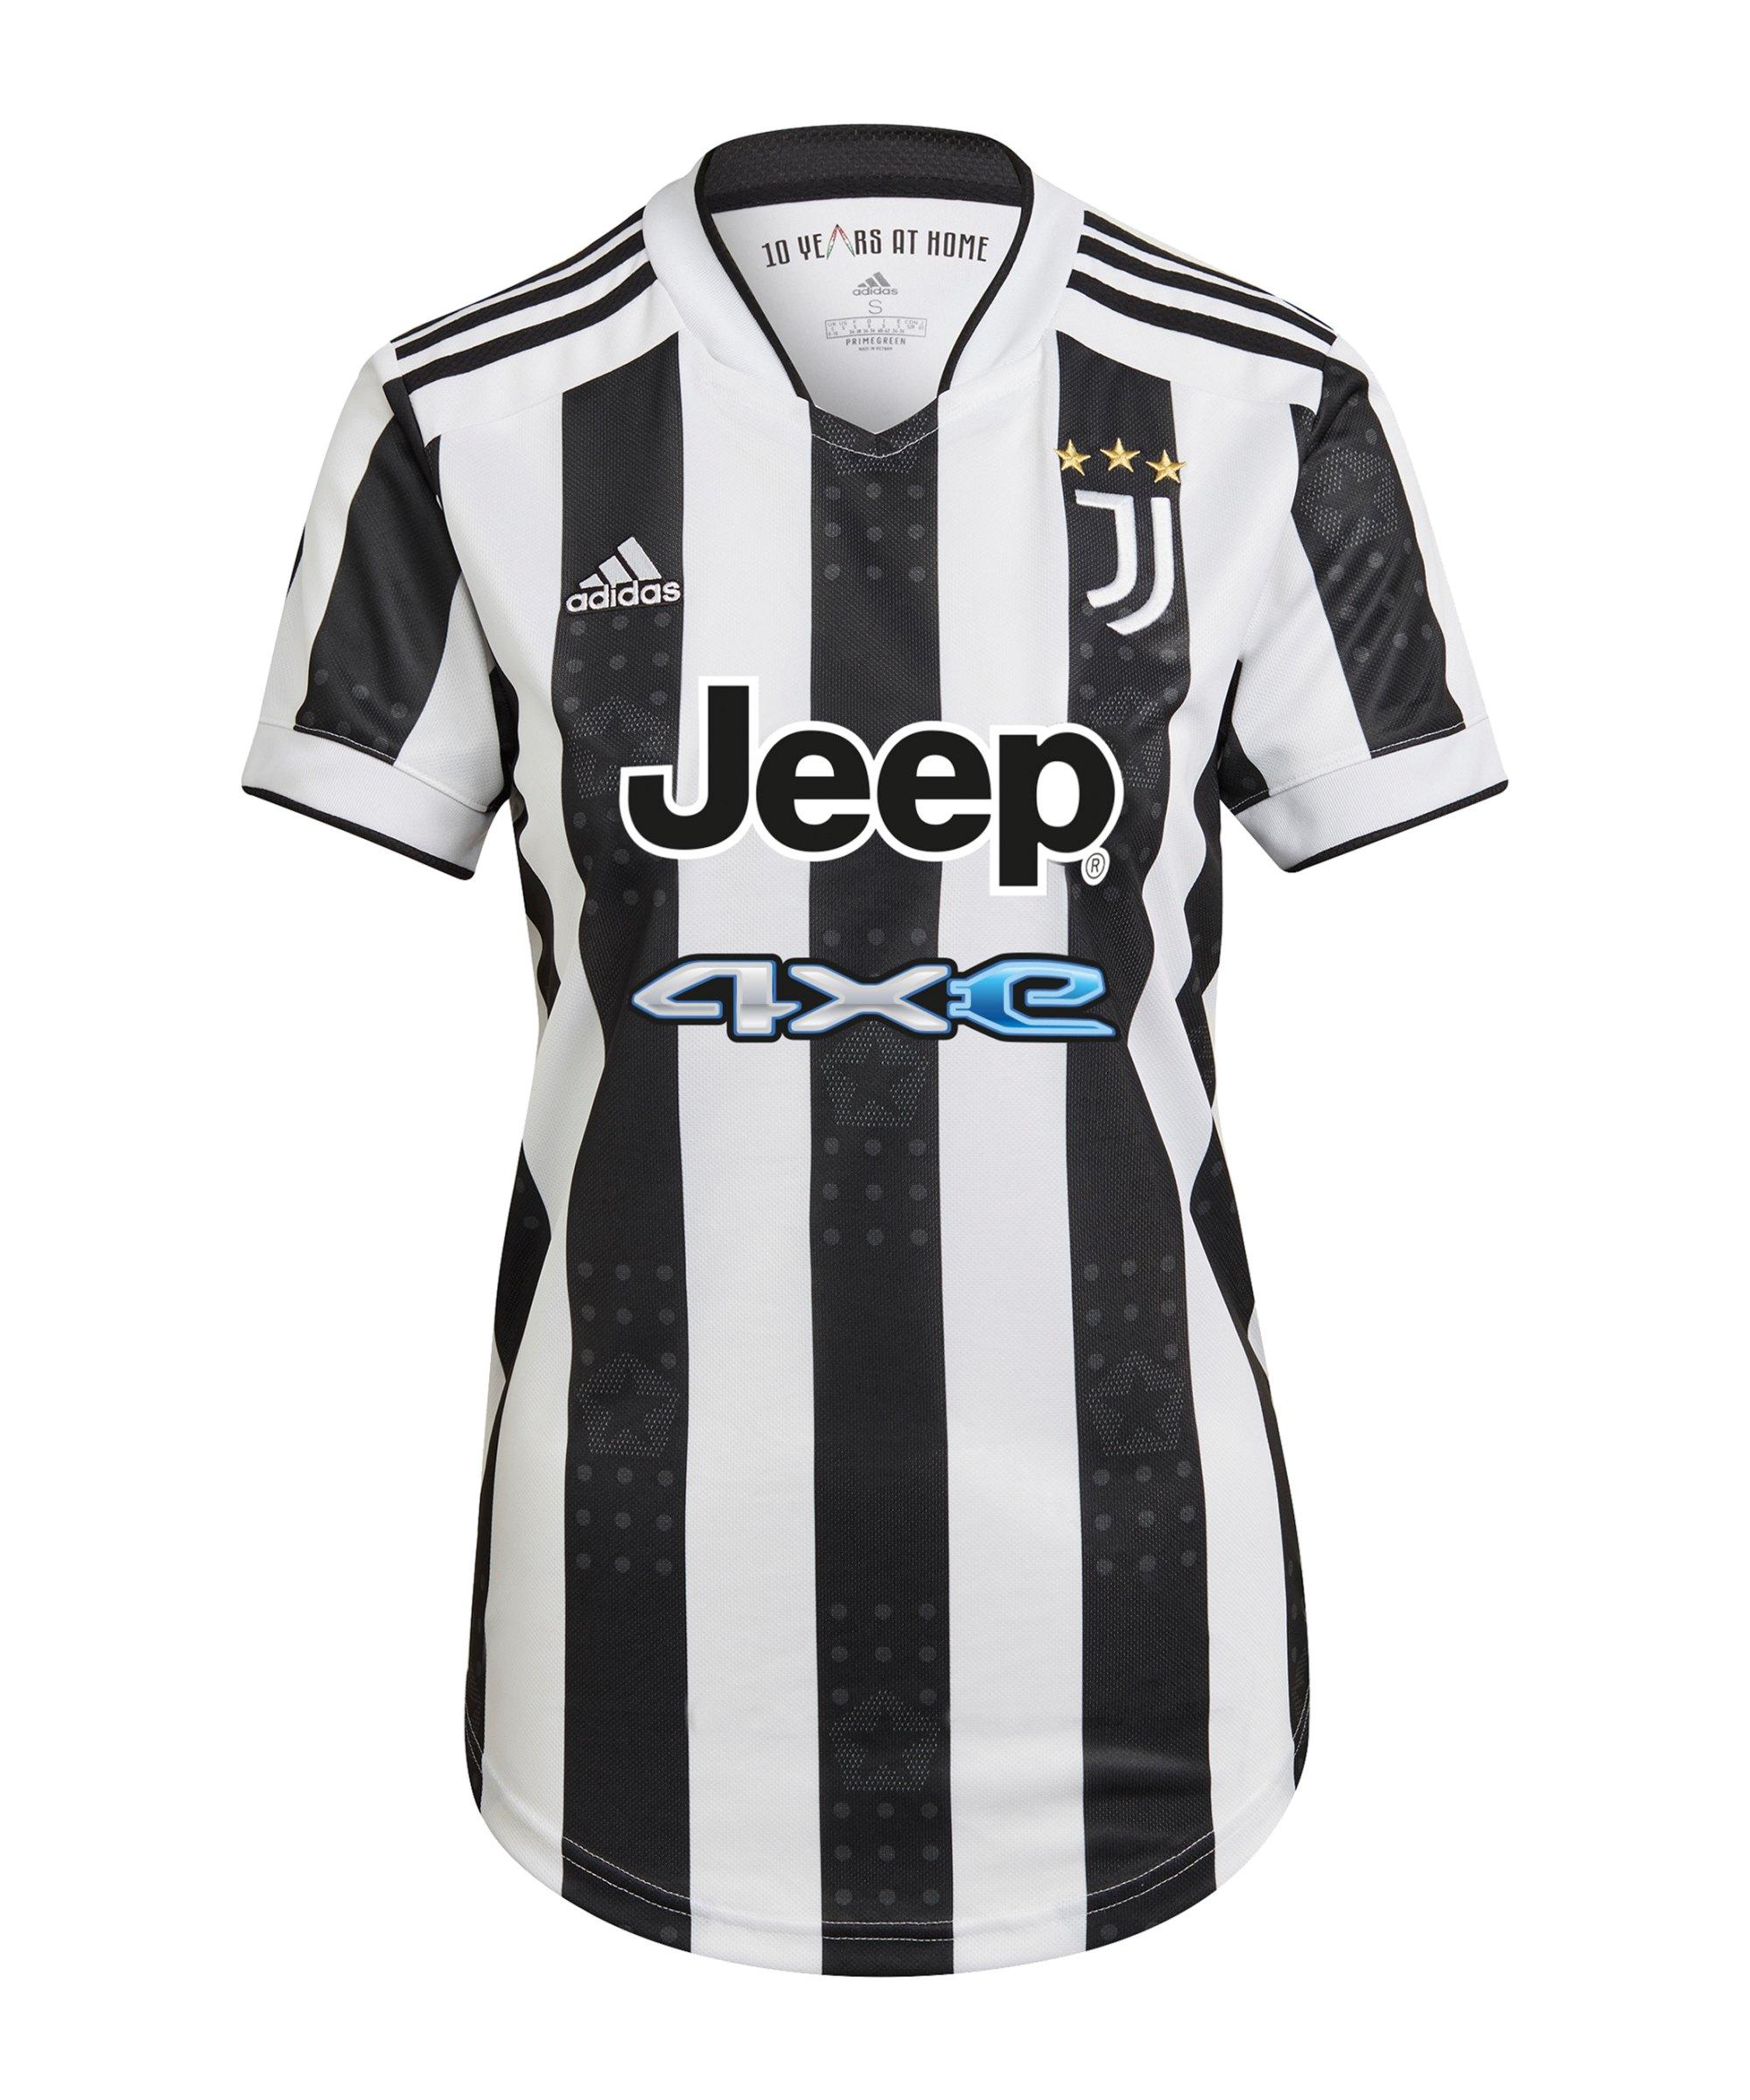 adidas Juventus Turin Trikot Home 2021/2022 Damen Weiss - weiss